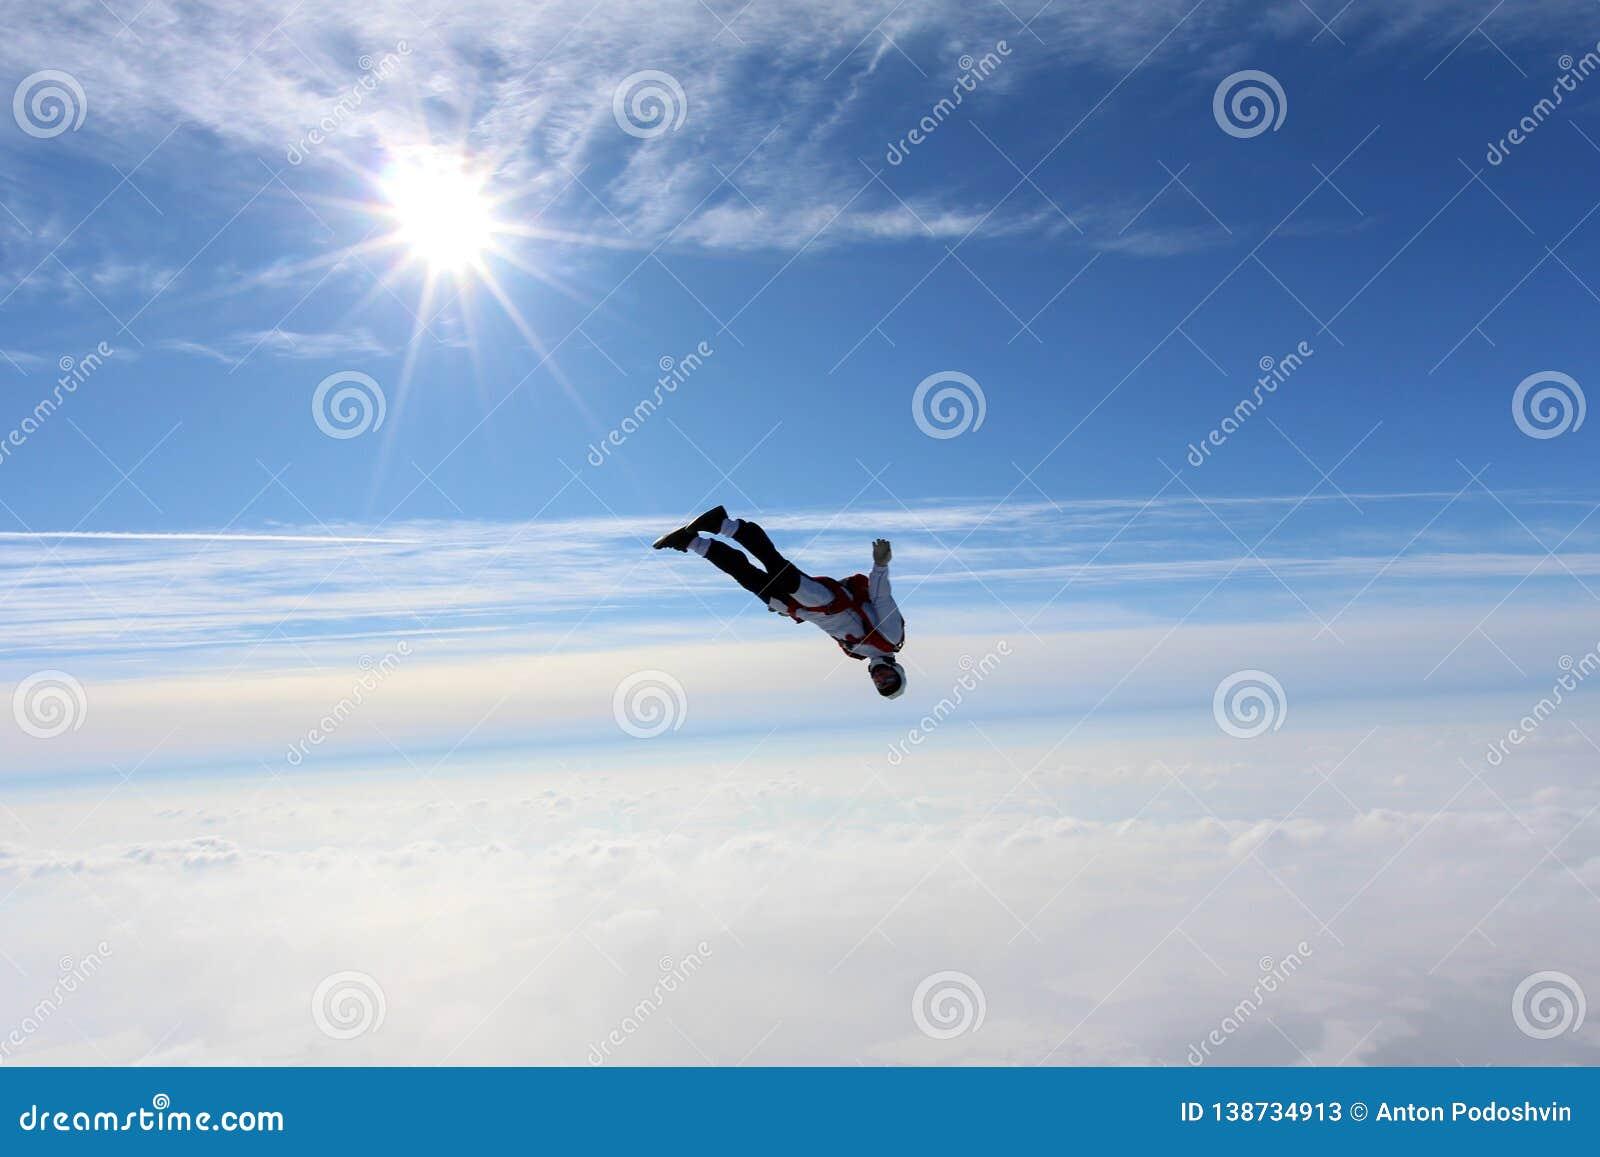 Skydiving Skydiver vliegt boven witte wolken